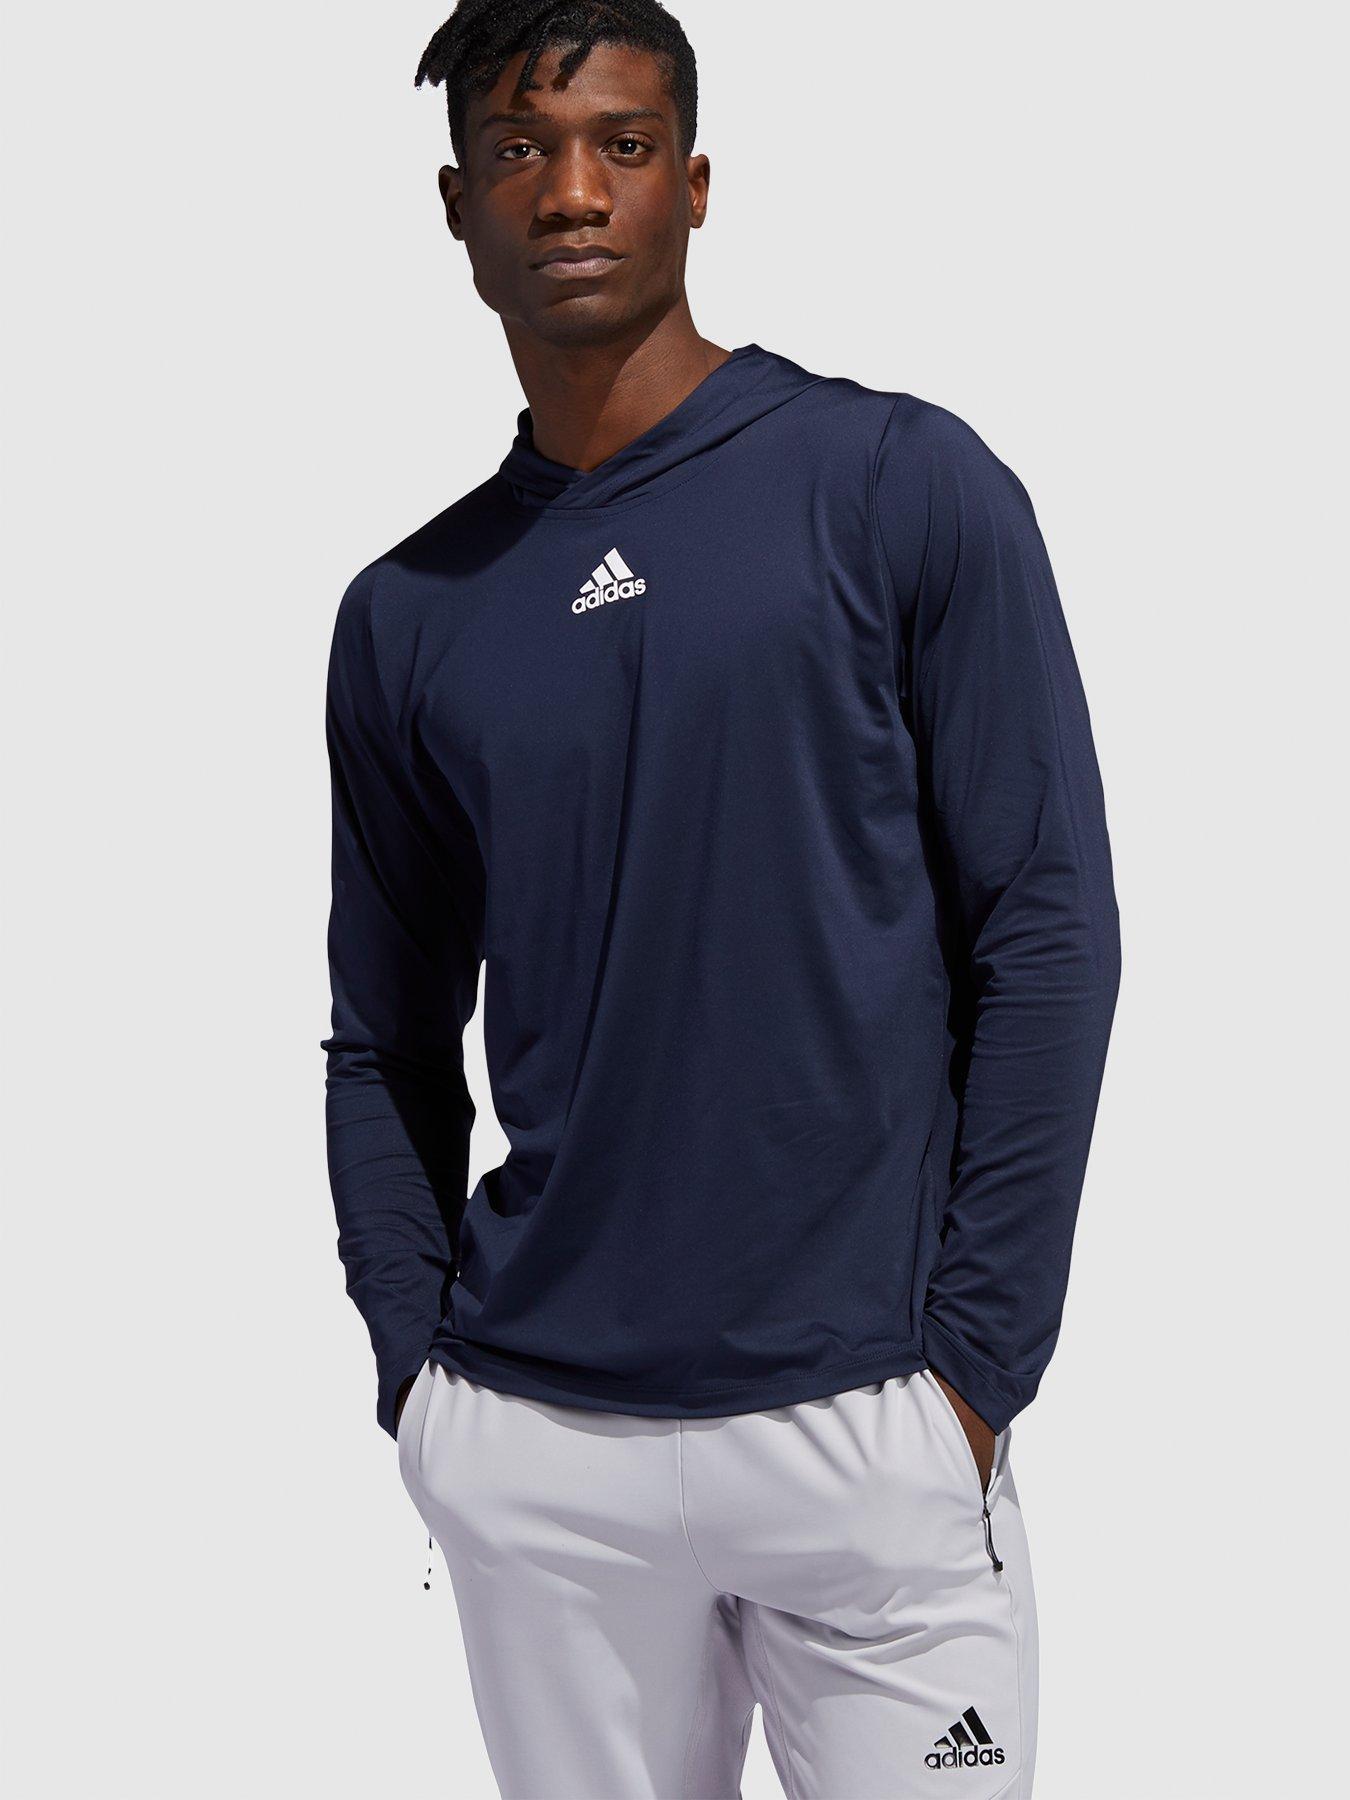 adidas Boys Long Sleeve Cotton Jersey Hooded T-Shirt Tee Boys Clothing